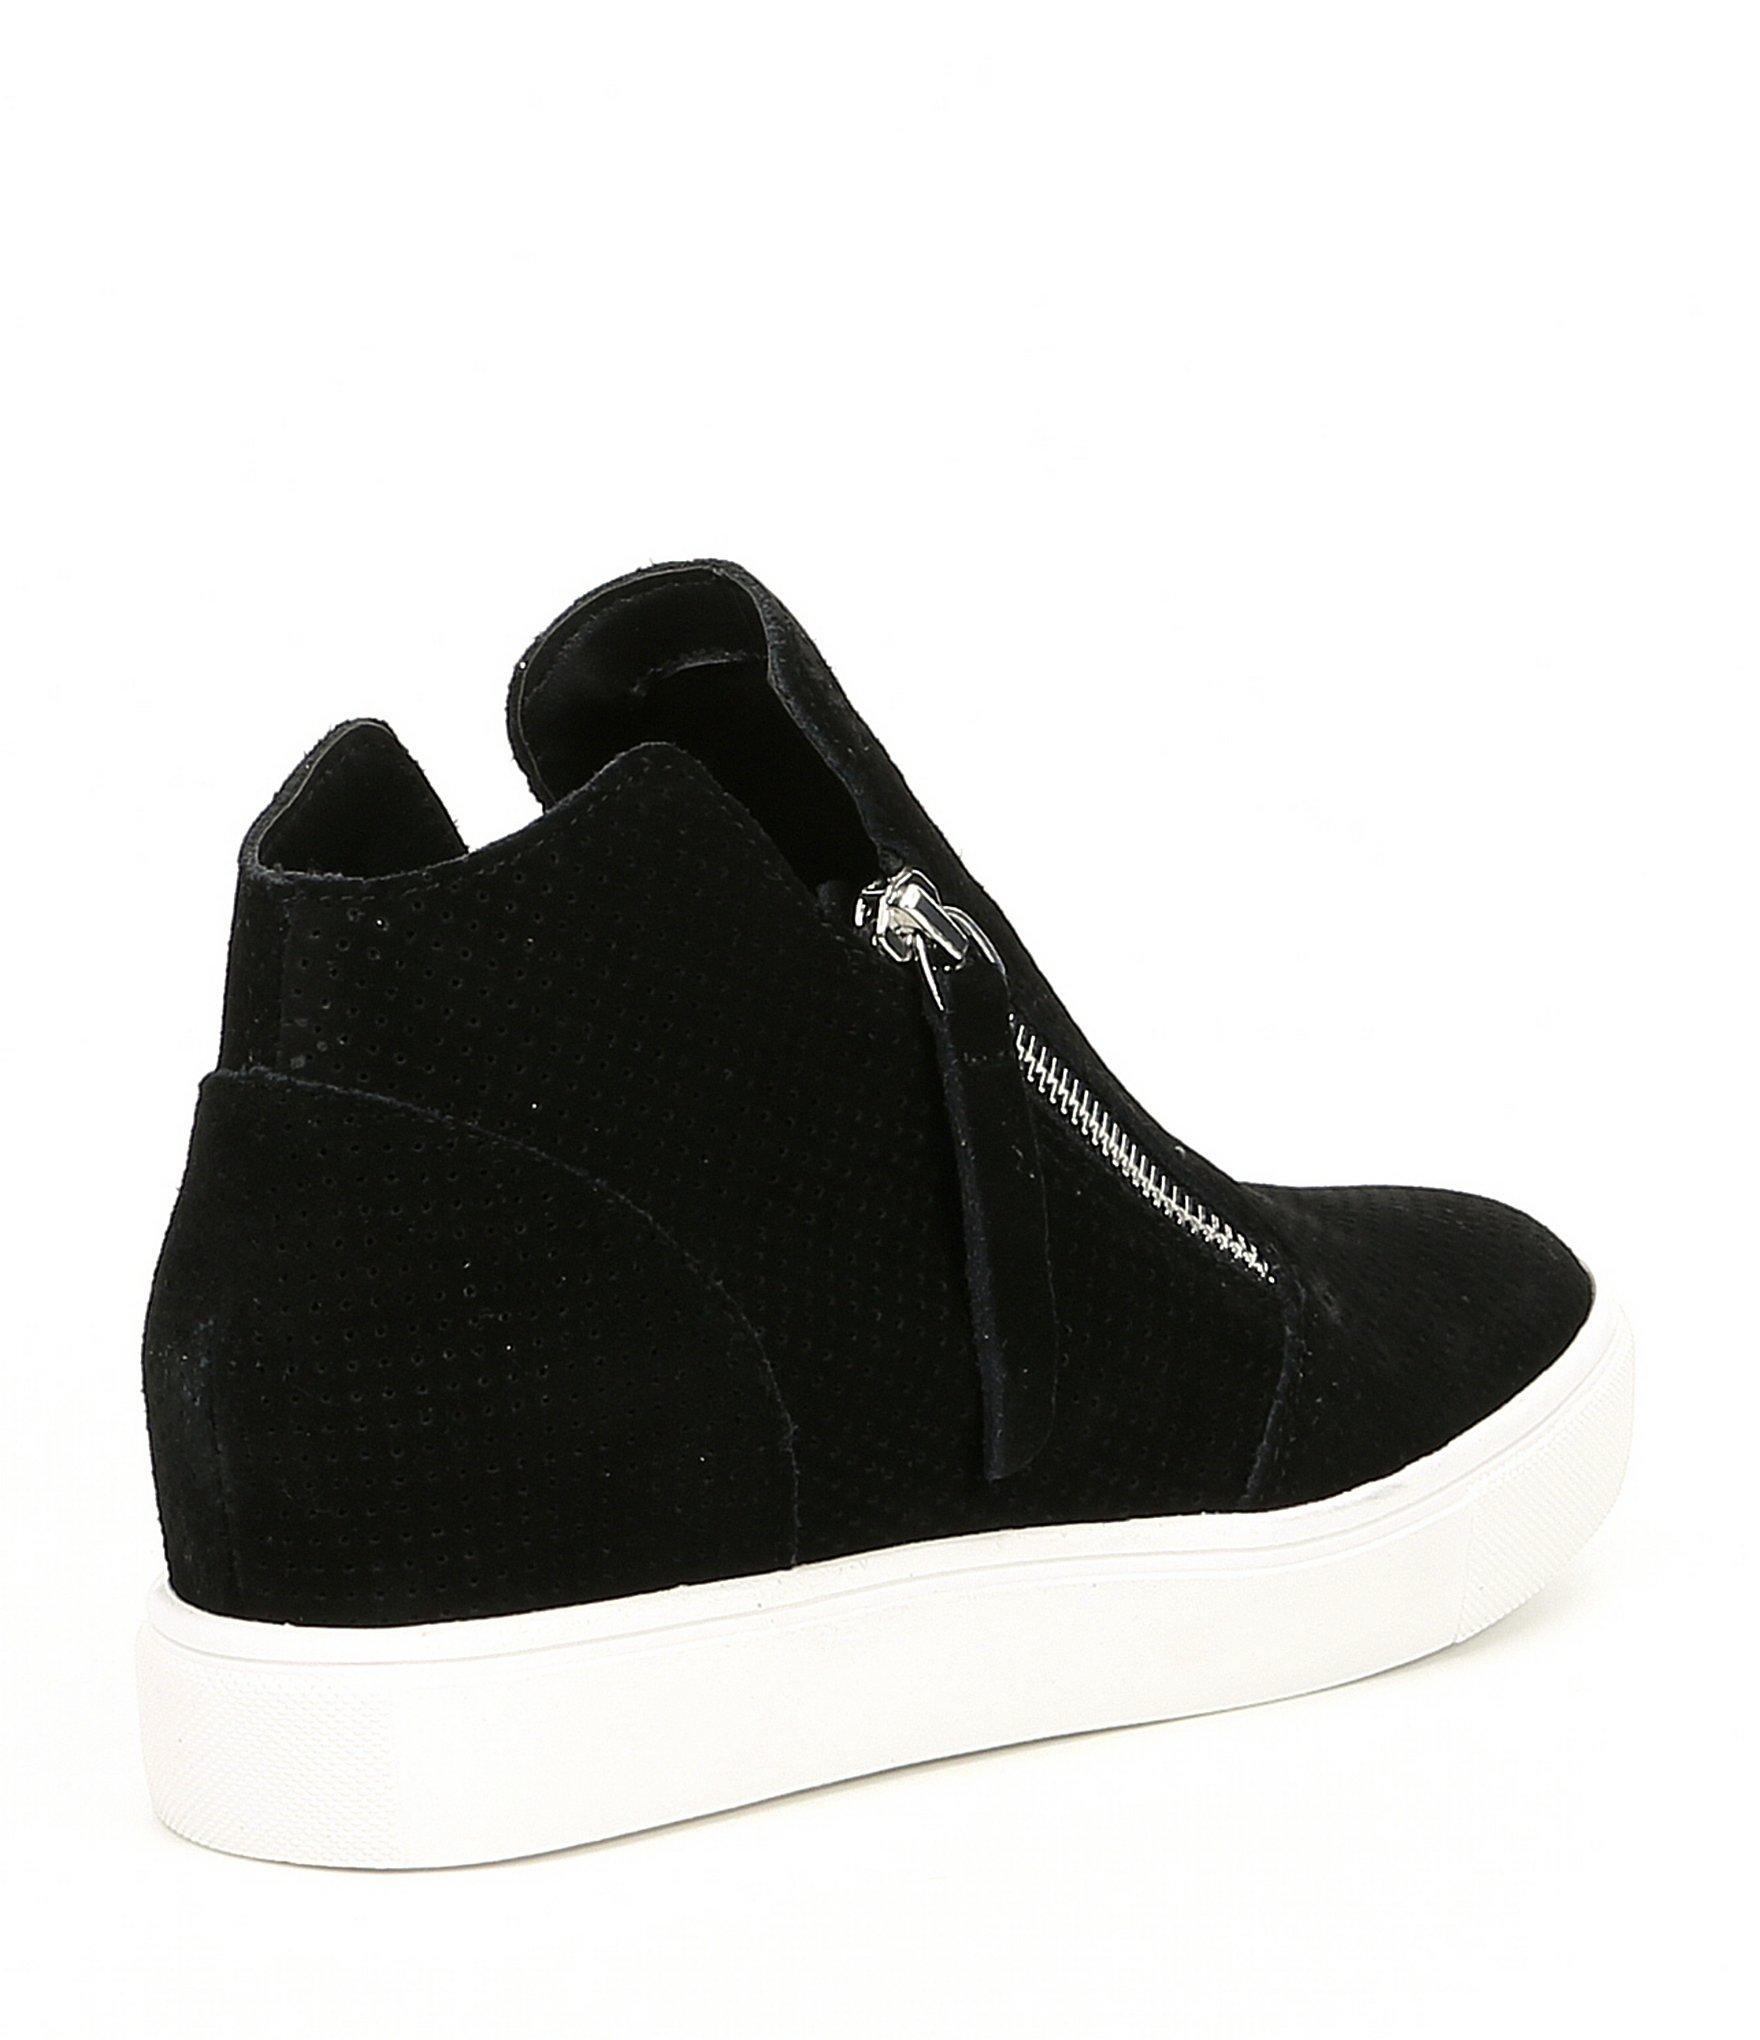 c51e2d8ac3e Steve Madden Caliber Wedge Sneakers in Black - Lyst